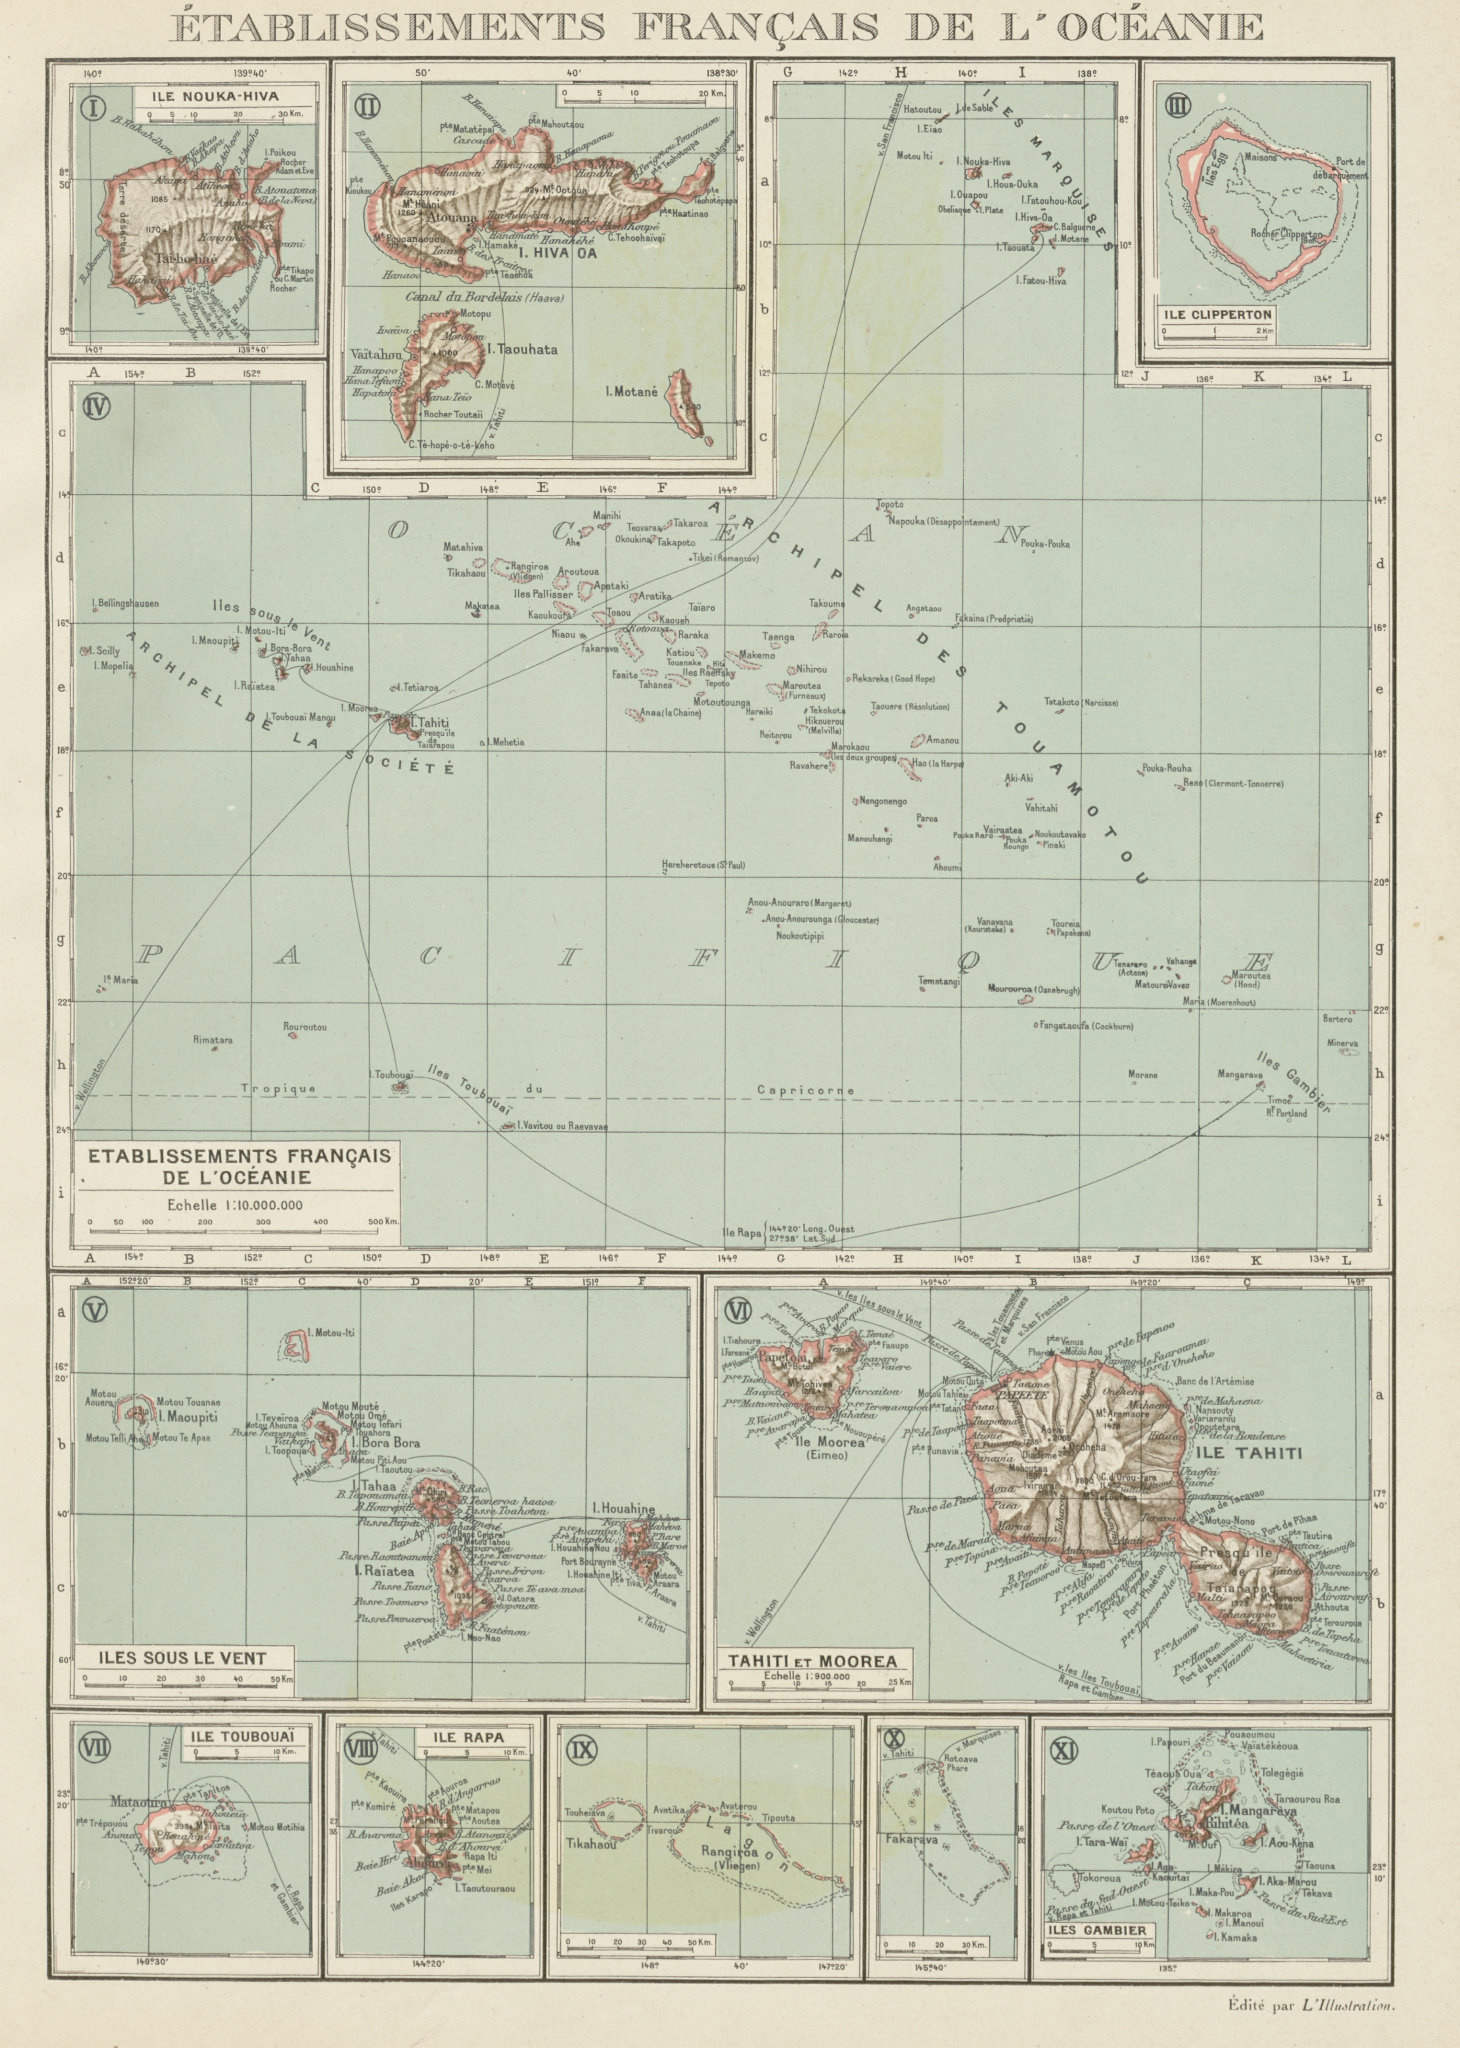 Associate Product FRENCH POLYNESIA. Polynésie française. Tahiti Moorea Nuka Hiva Oa 1929 old map